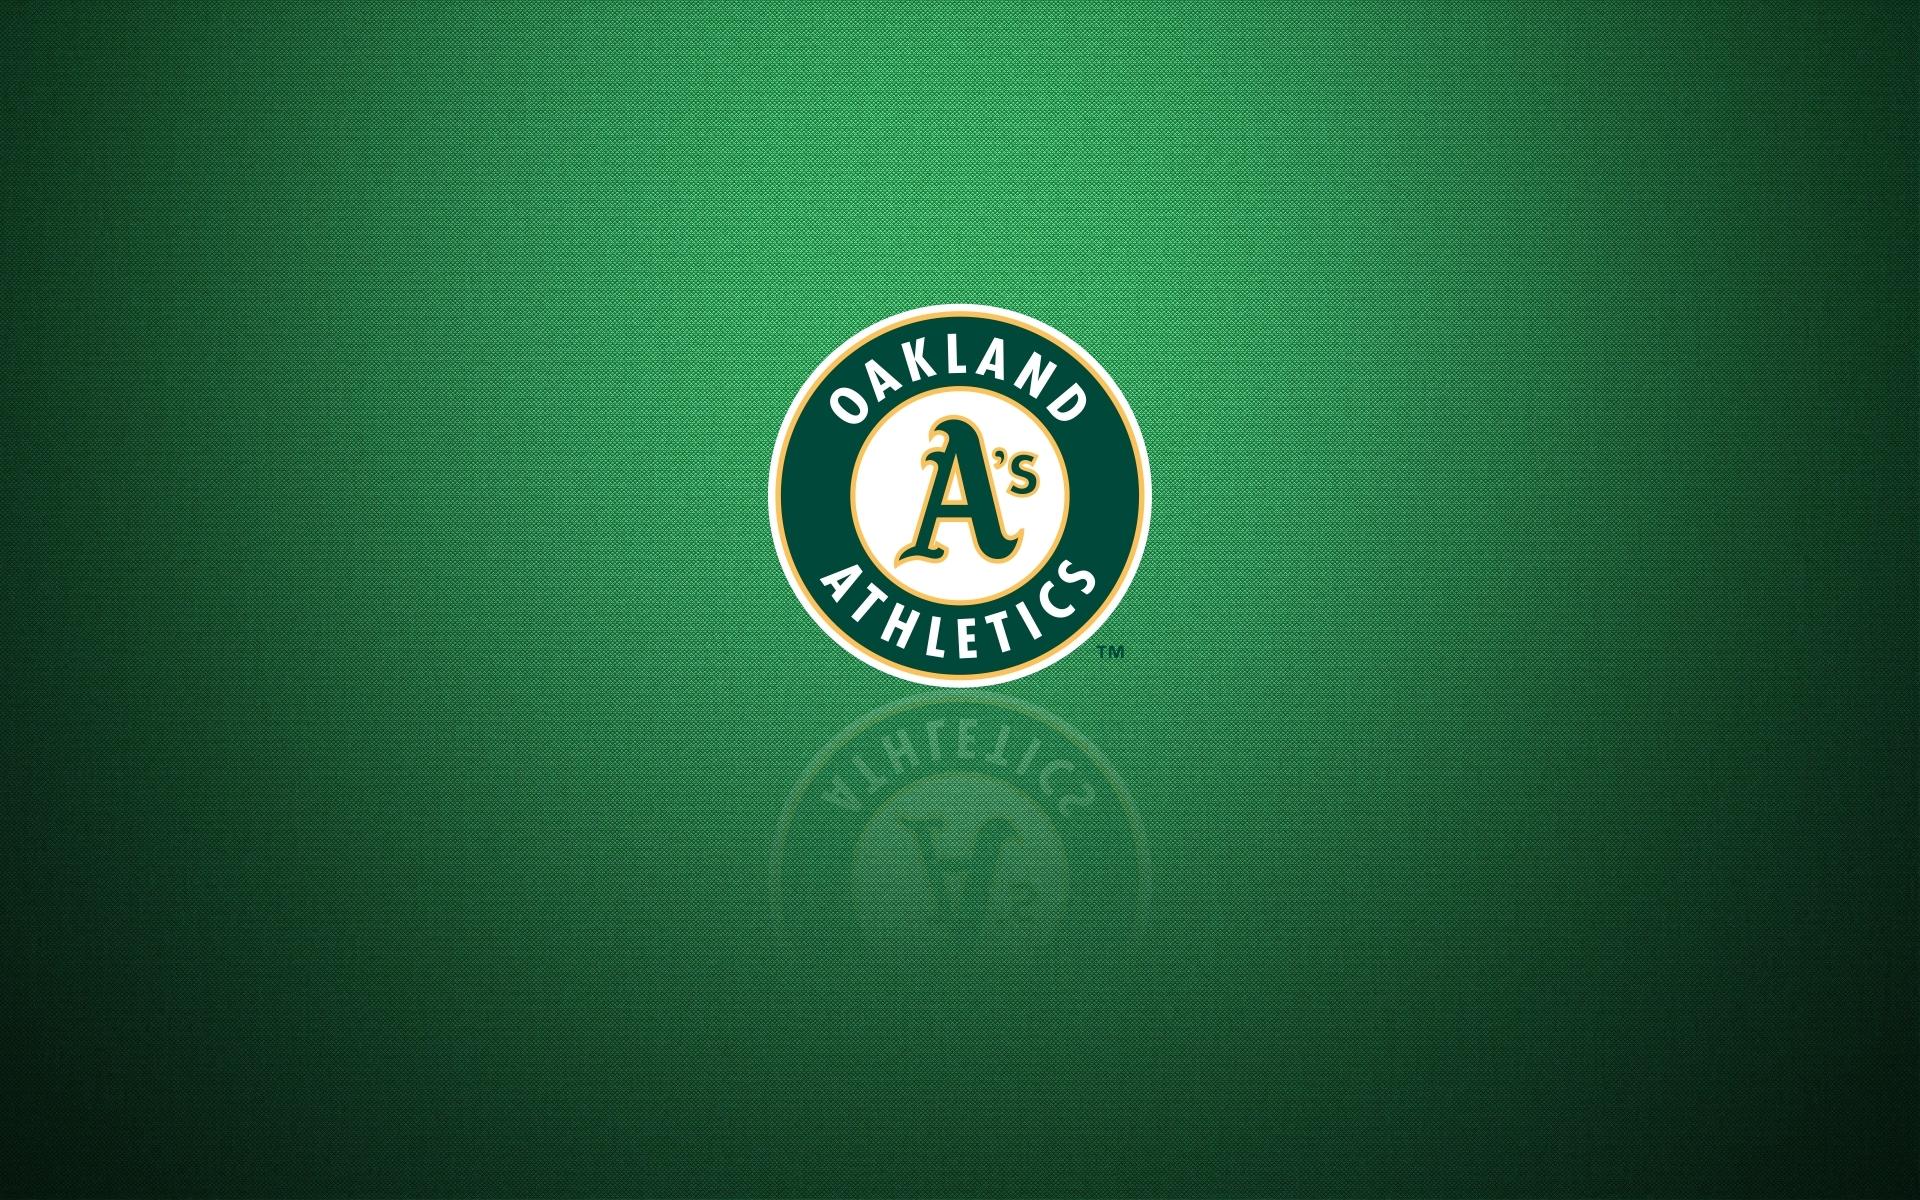 oakland athletics logos download ny yankees logo vector free new york yankees logo vector file